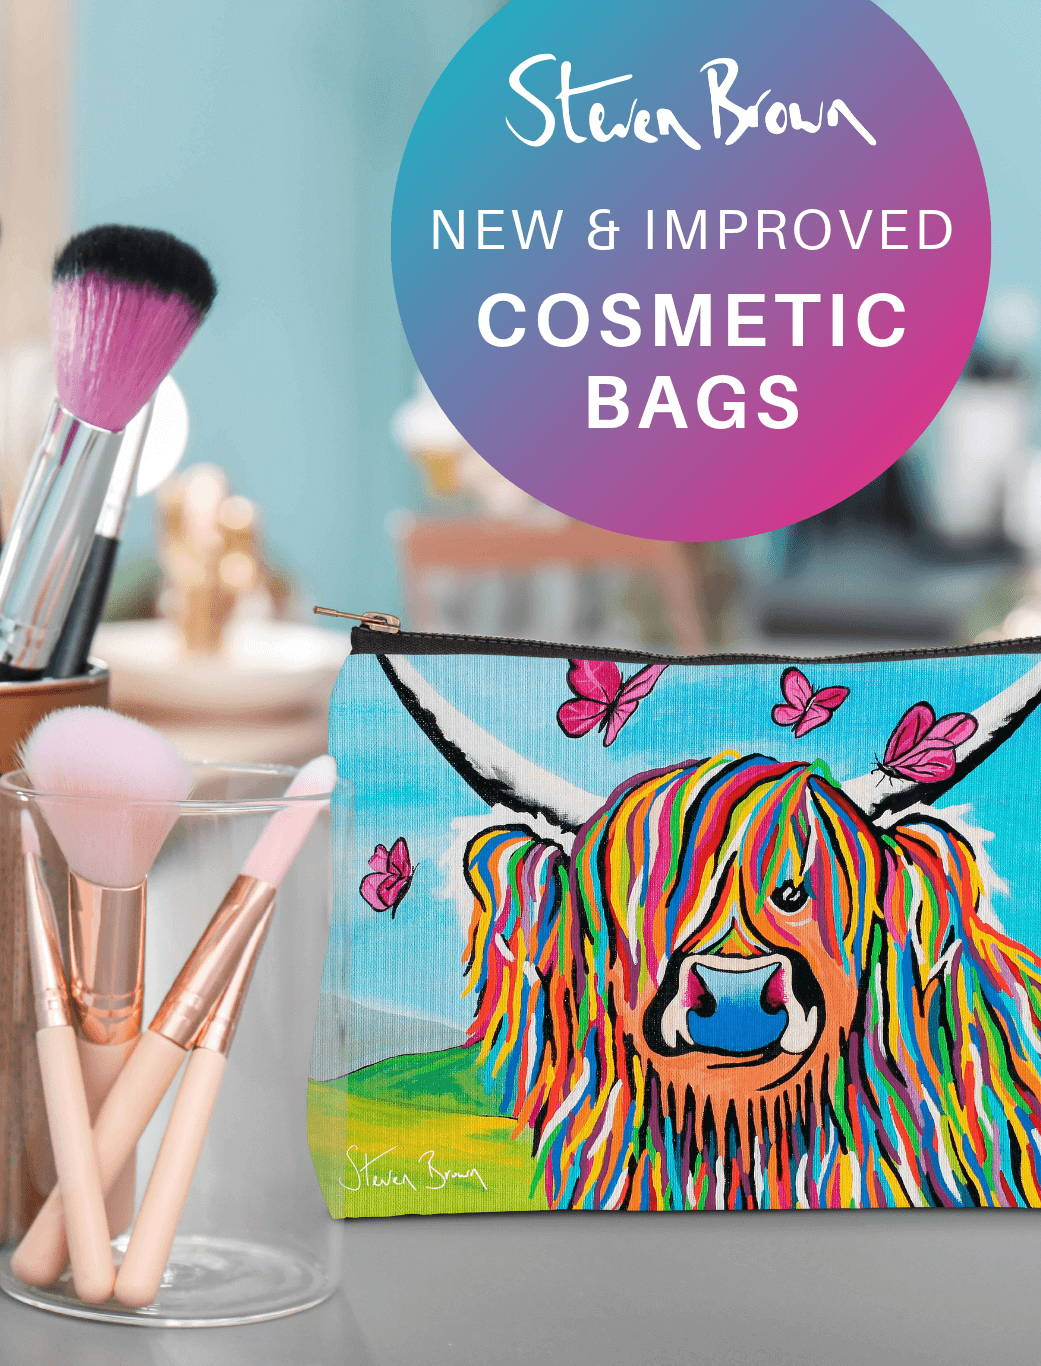 Steven Brown Cosmetic Bags